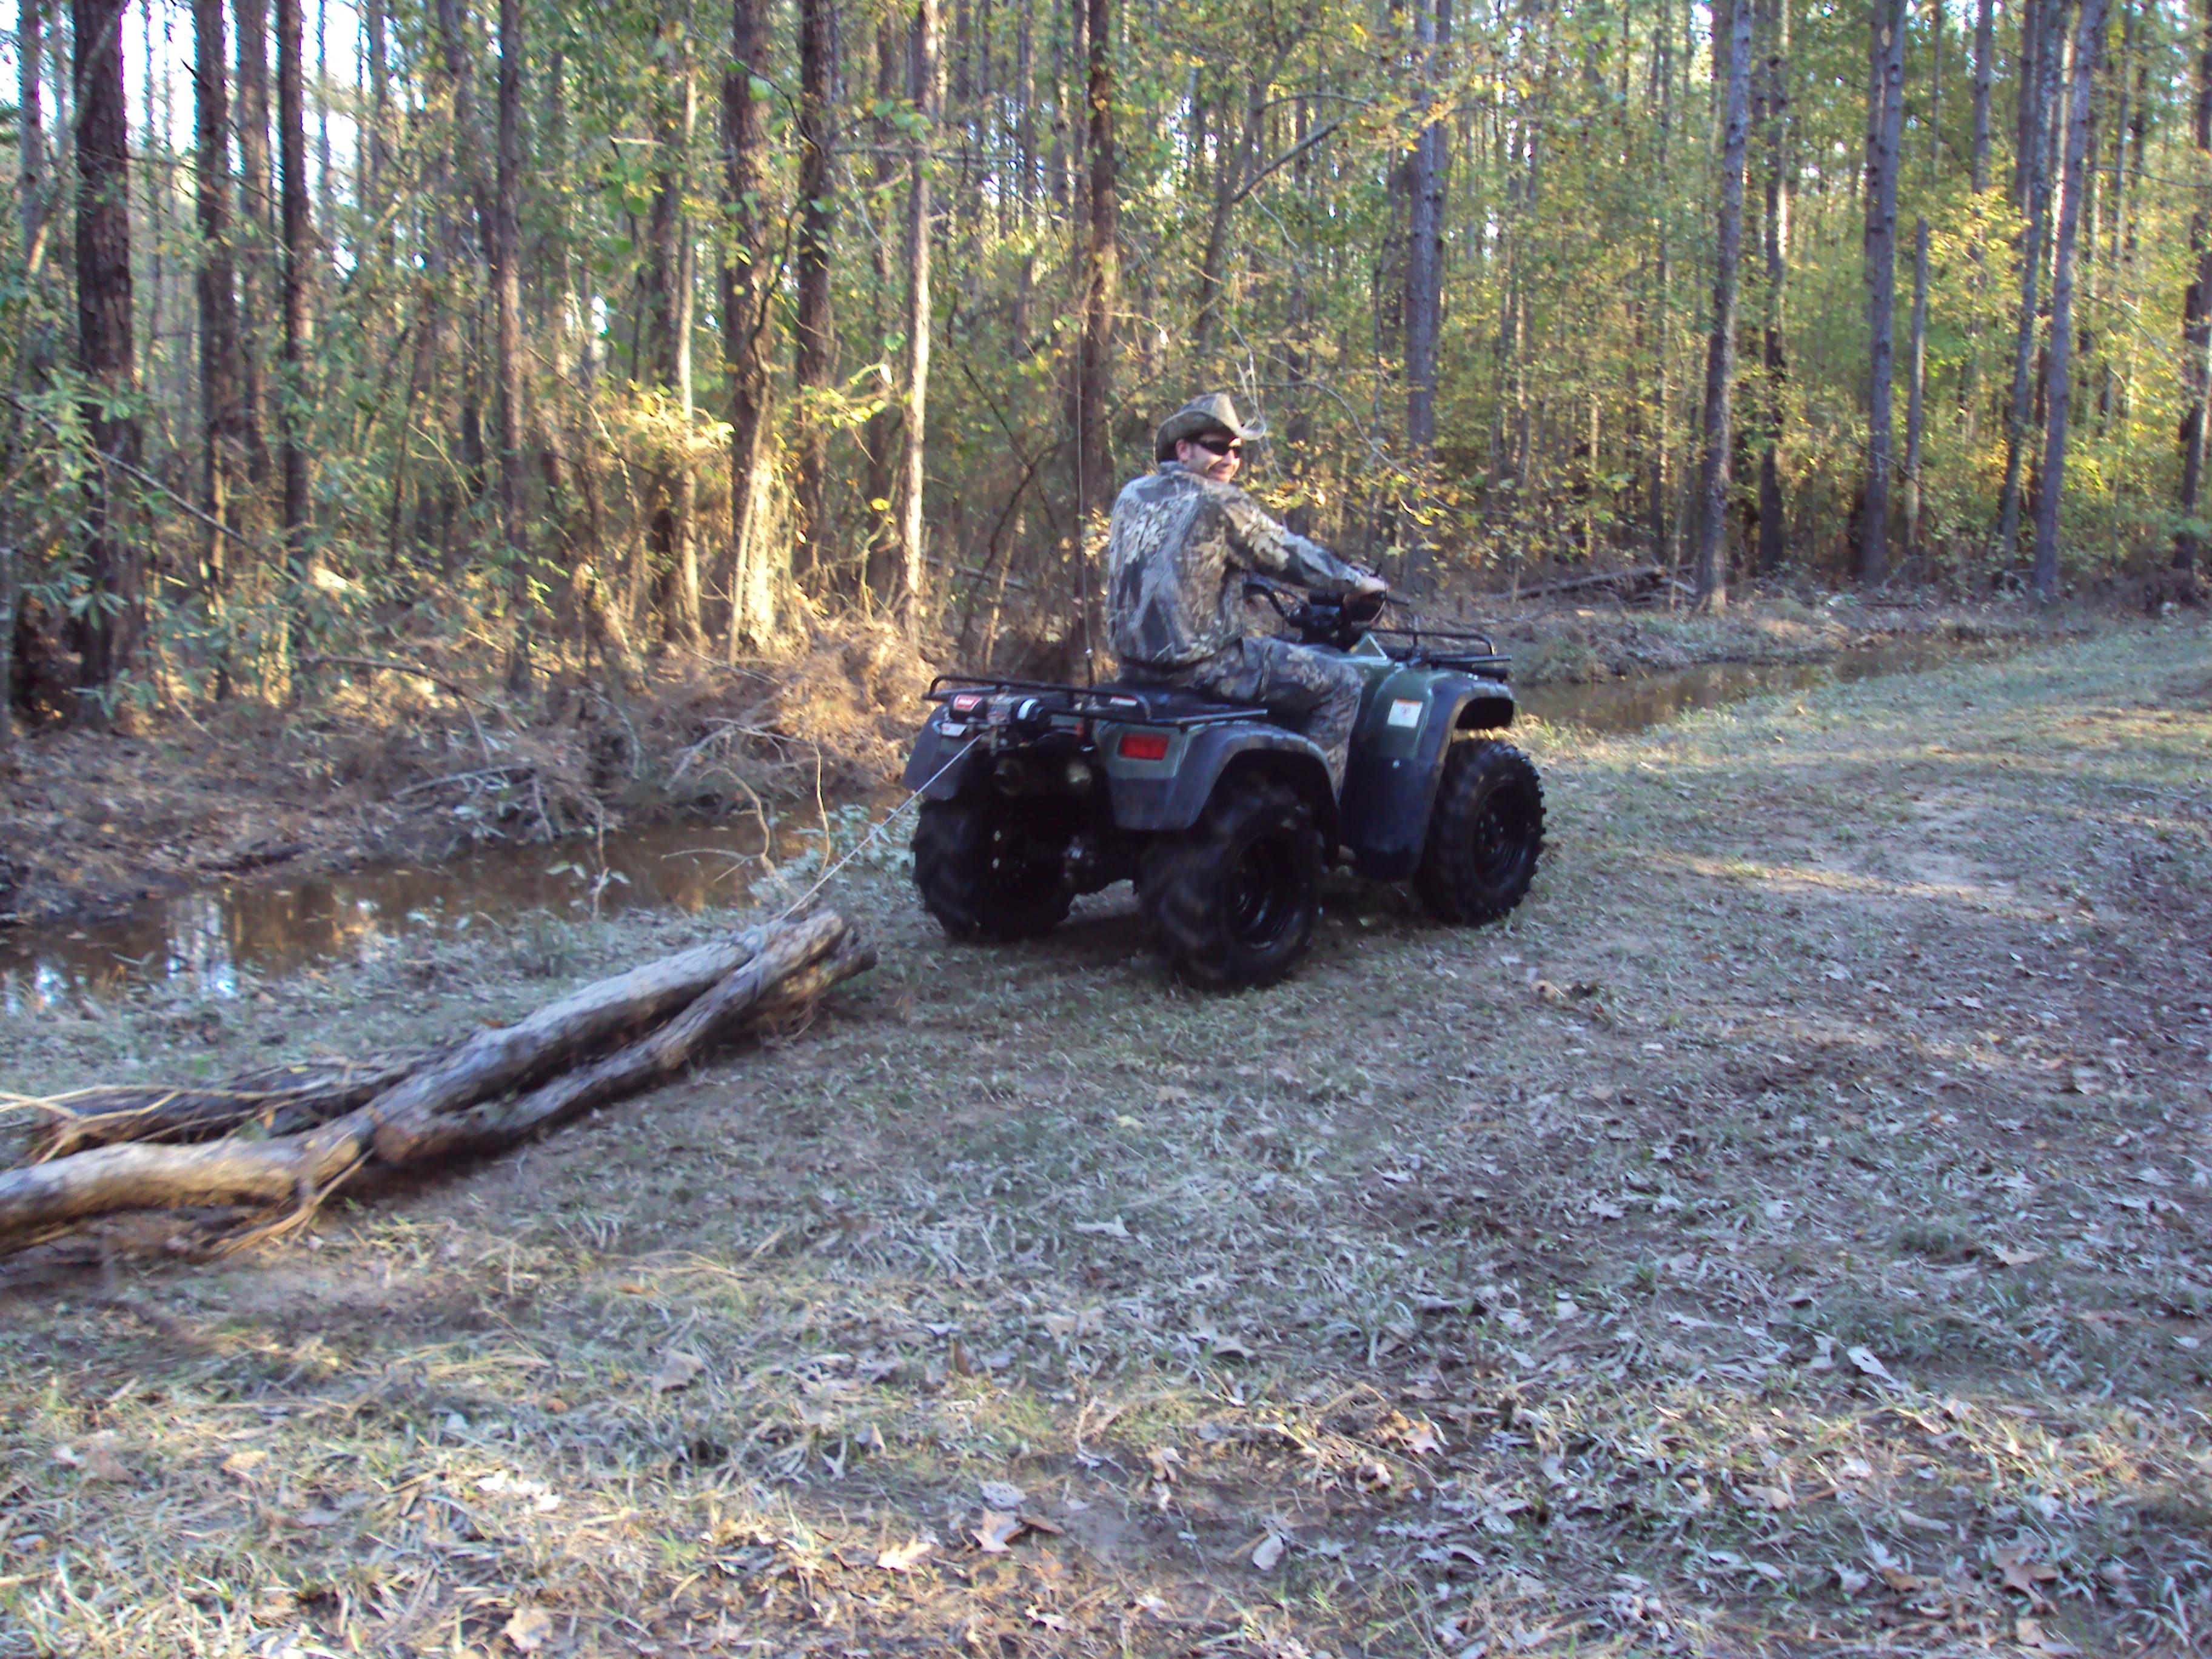 Honda Foreman in Action | Nicholas Fluhart